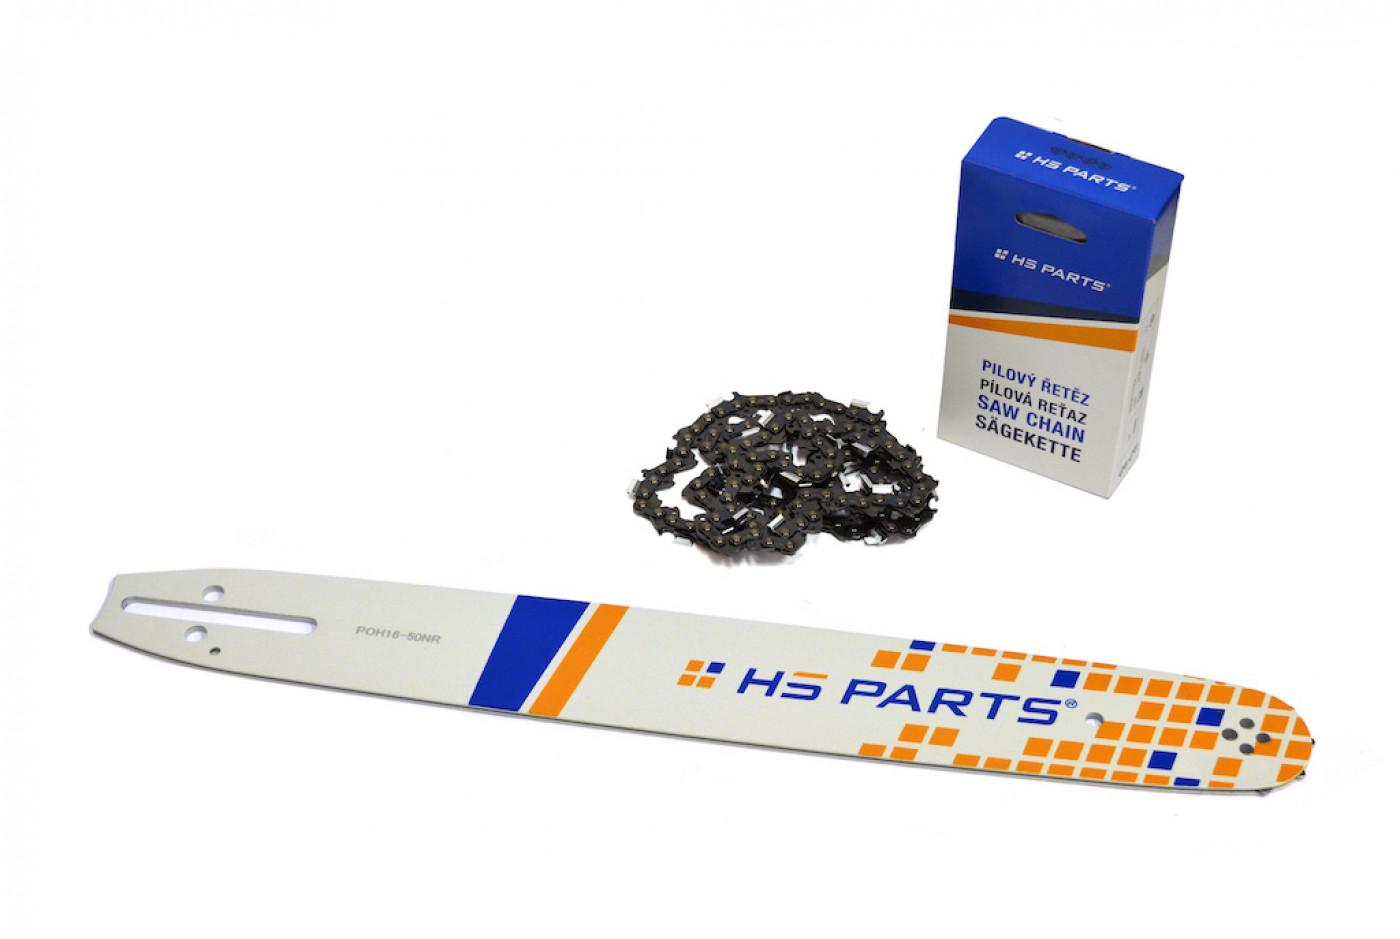 Lišta 40cm +2x řetez 56 čl. 3/8 1,3mm + řetězka Partner 350 351 370 390 420